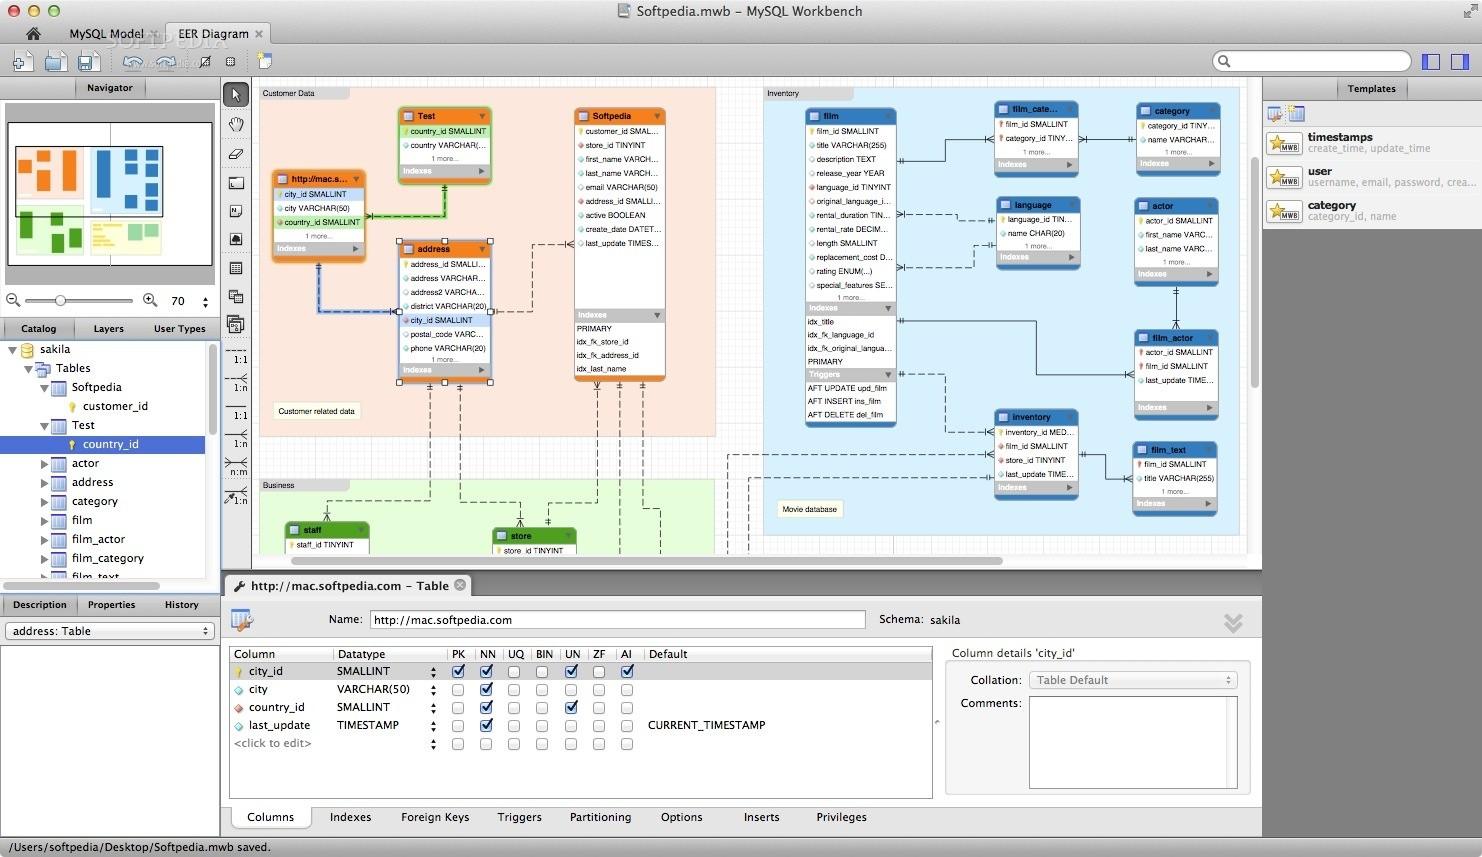 MySQL Workbench Mac 8.0.21 - Download